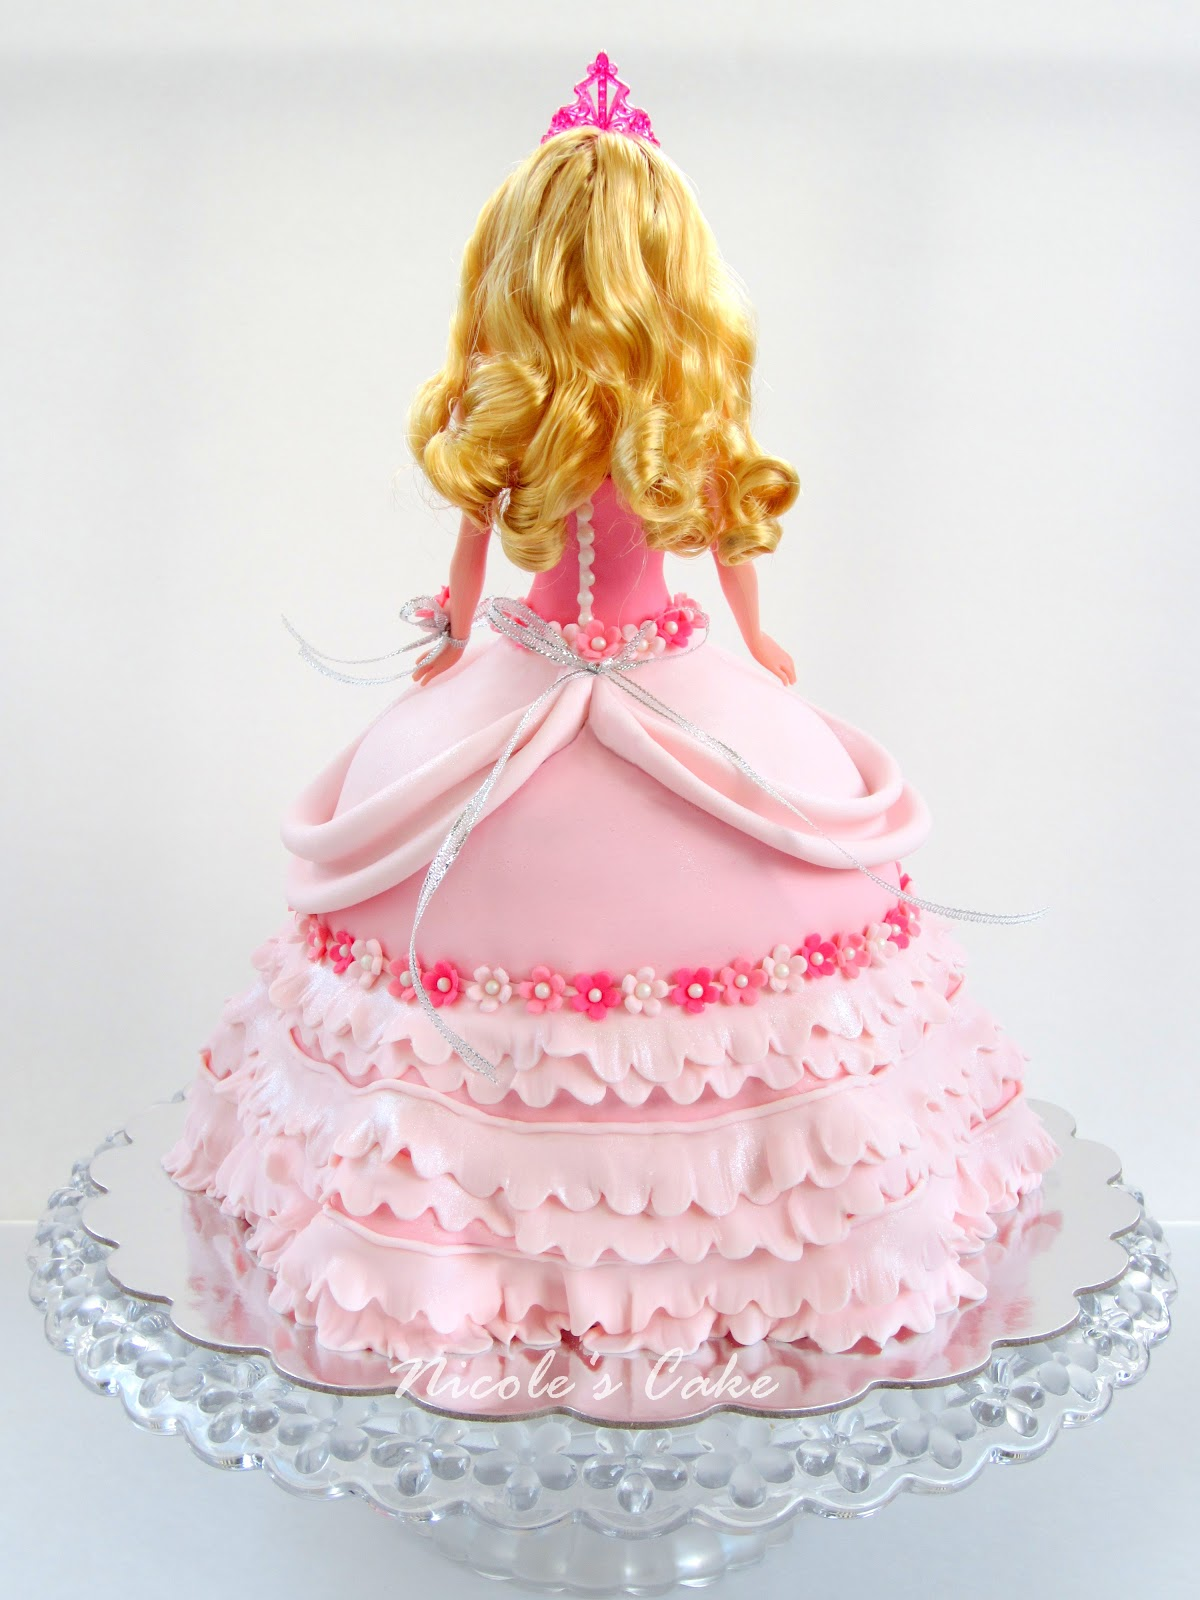 http://3.bp.blogspot.com/-3ASisUYLdGk/UKB5_fOD3MI/AAAAAAAADWE/adoZmXBH3mw/s1600/Aurora+Doll+Cake+2+protected.JPG